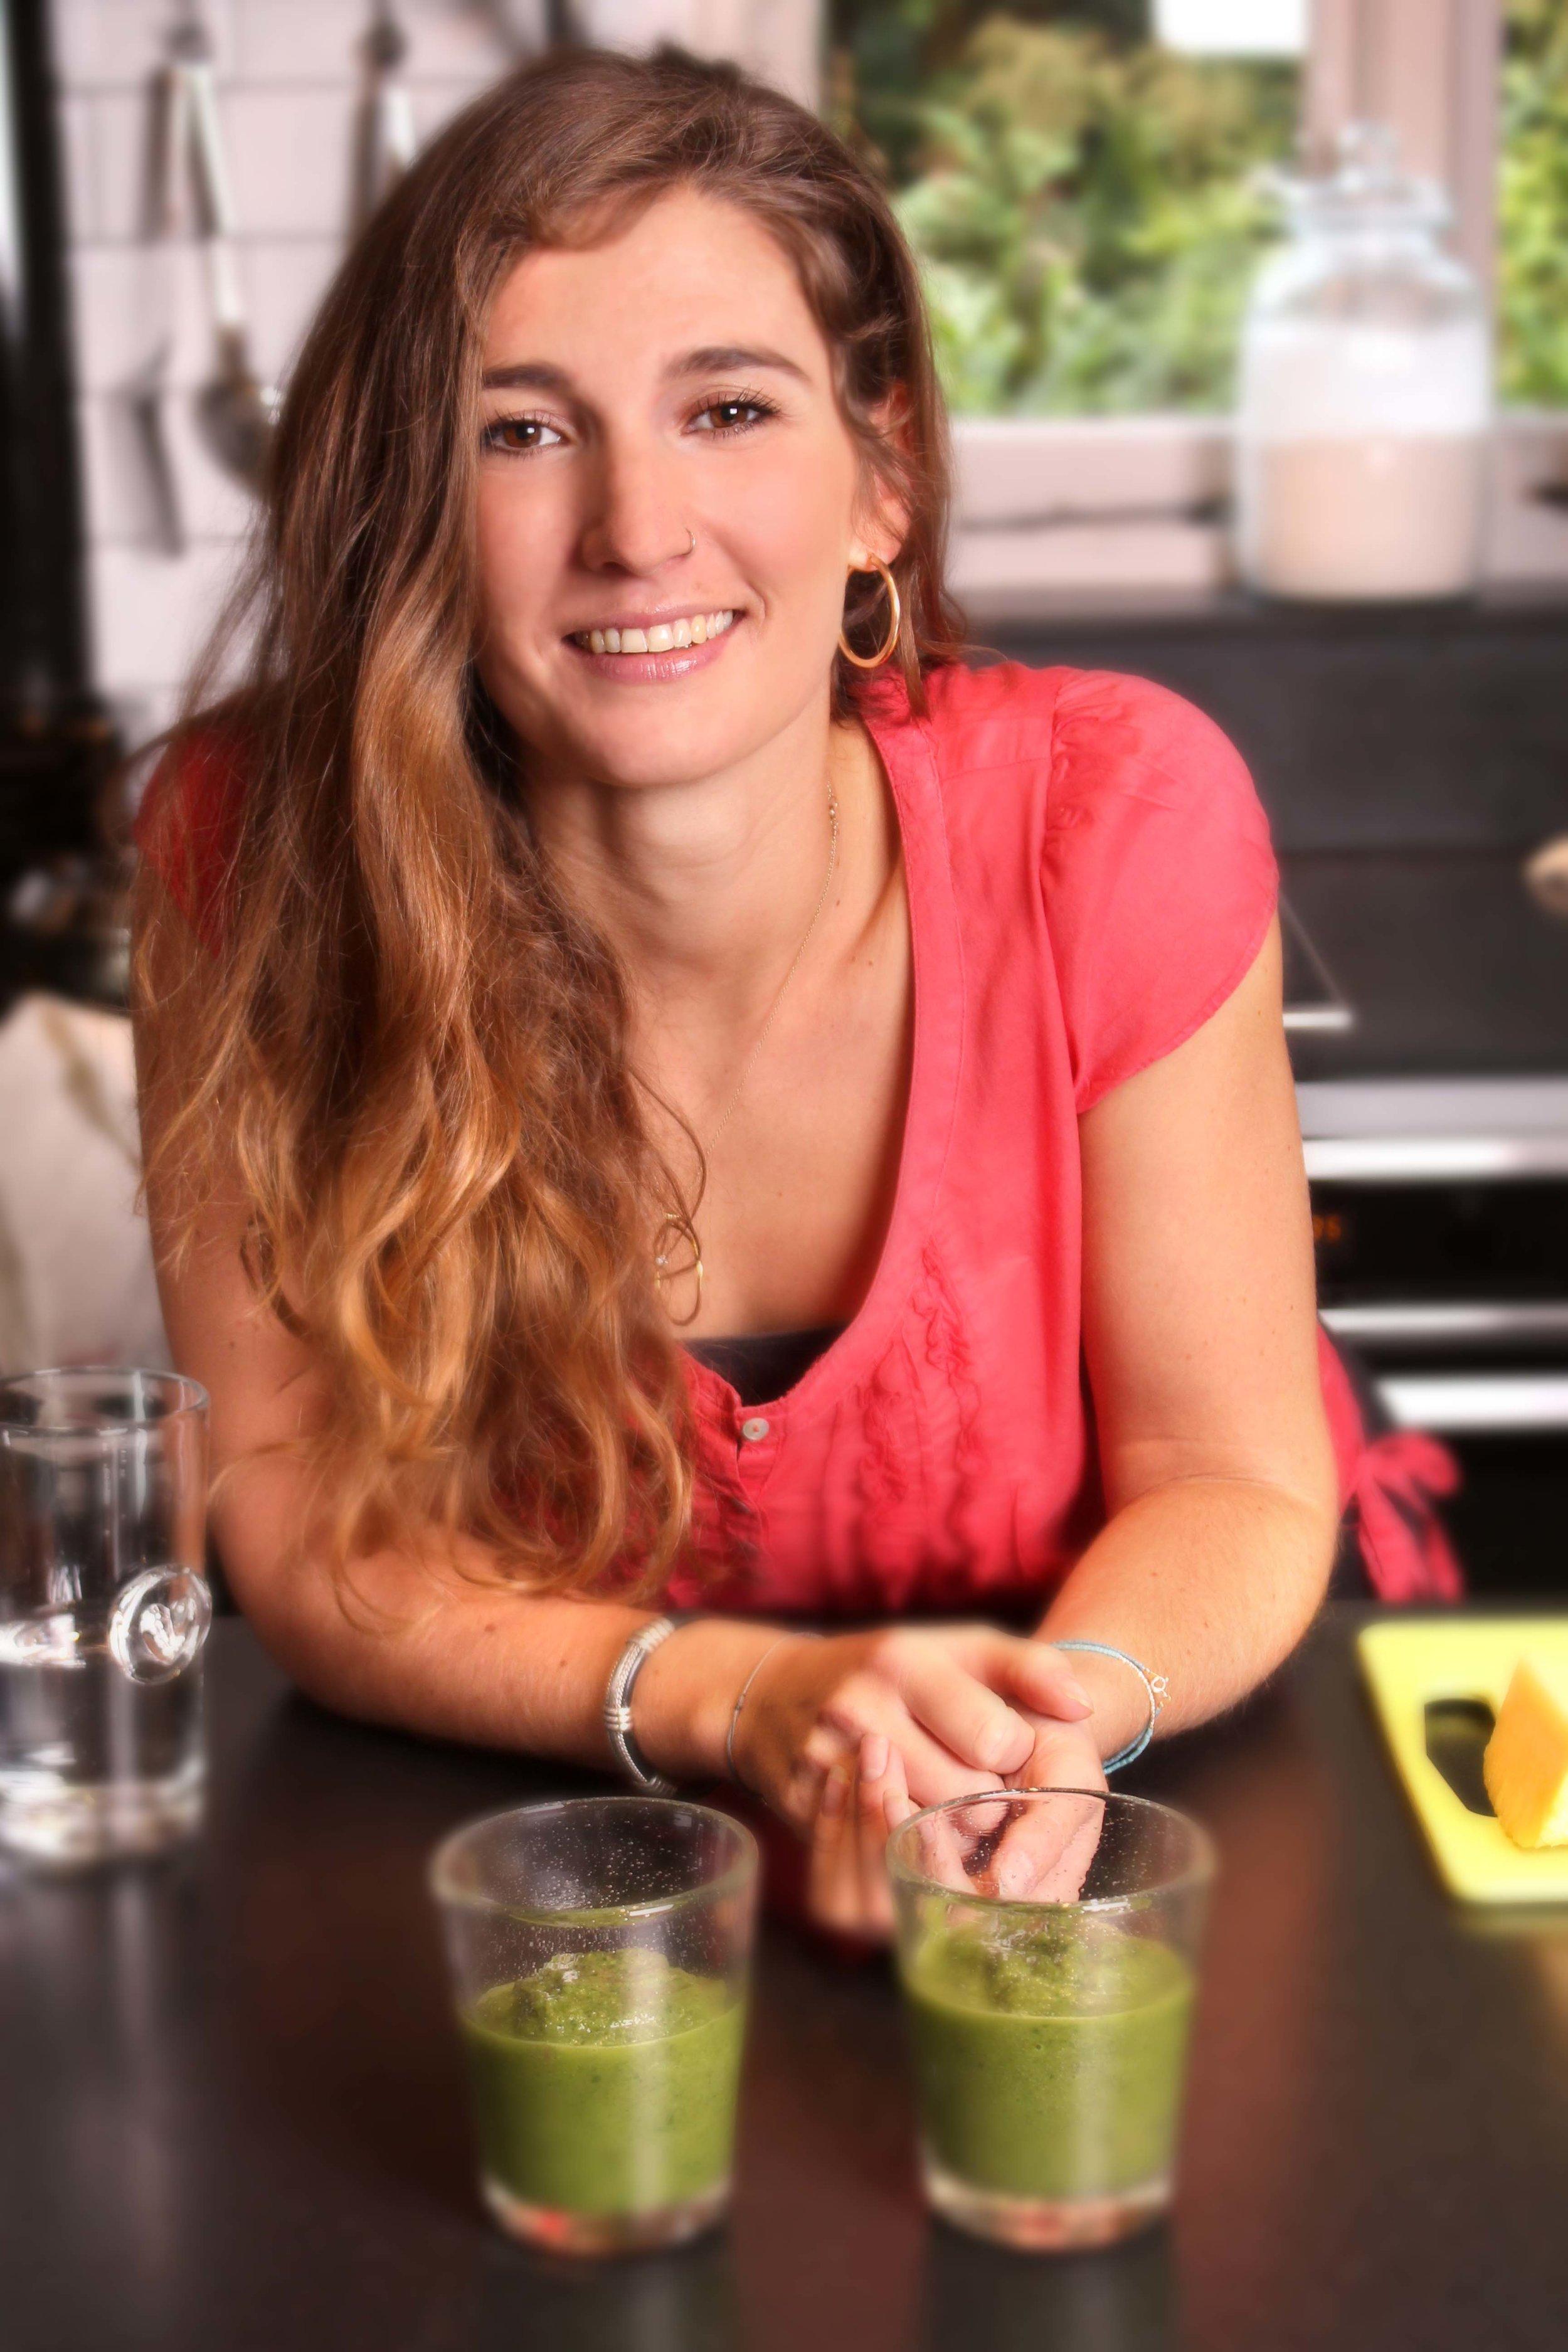 Chloe Manlay